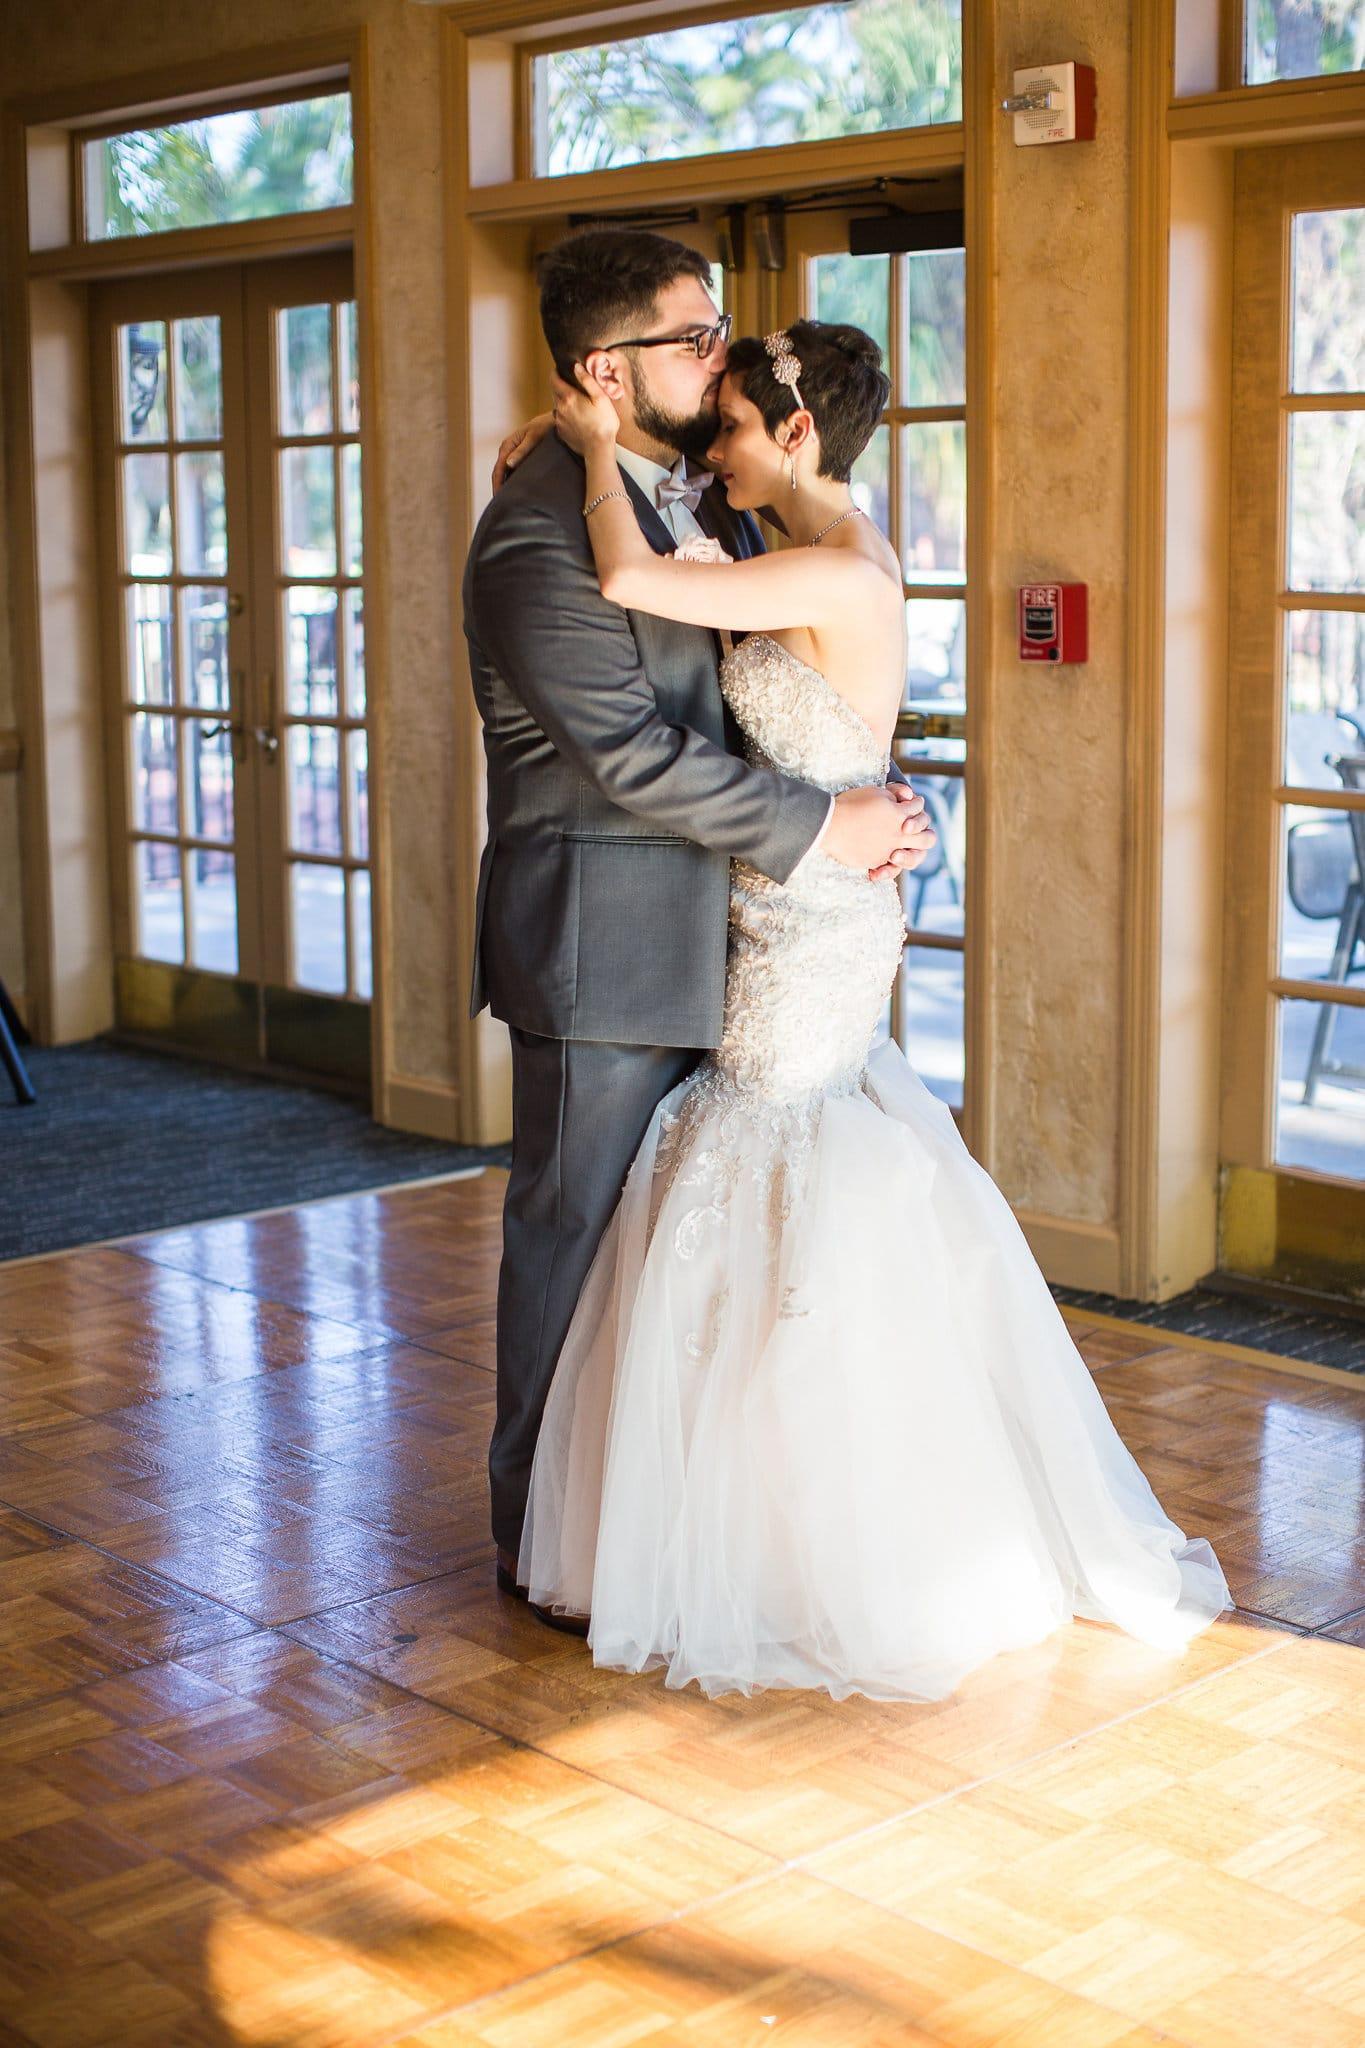 Bride and groom's first intimate dance at El Conquistador